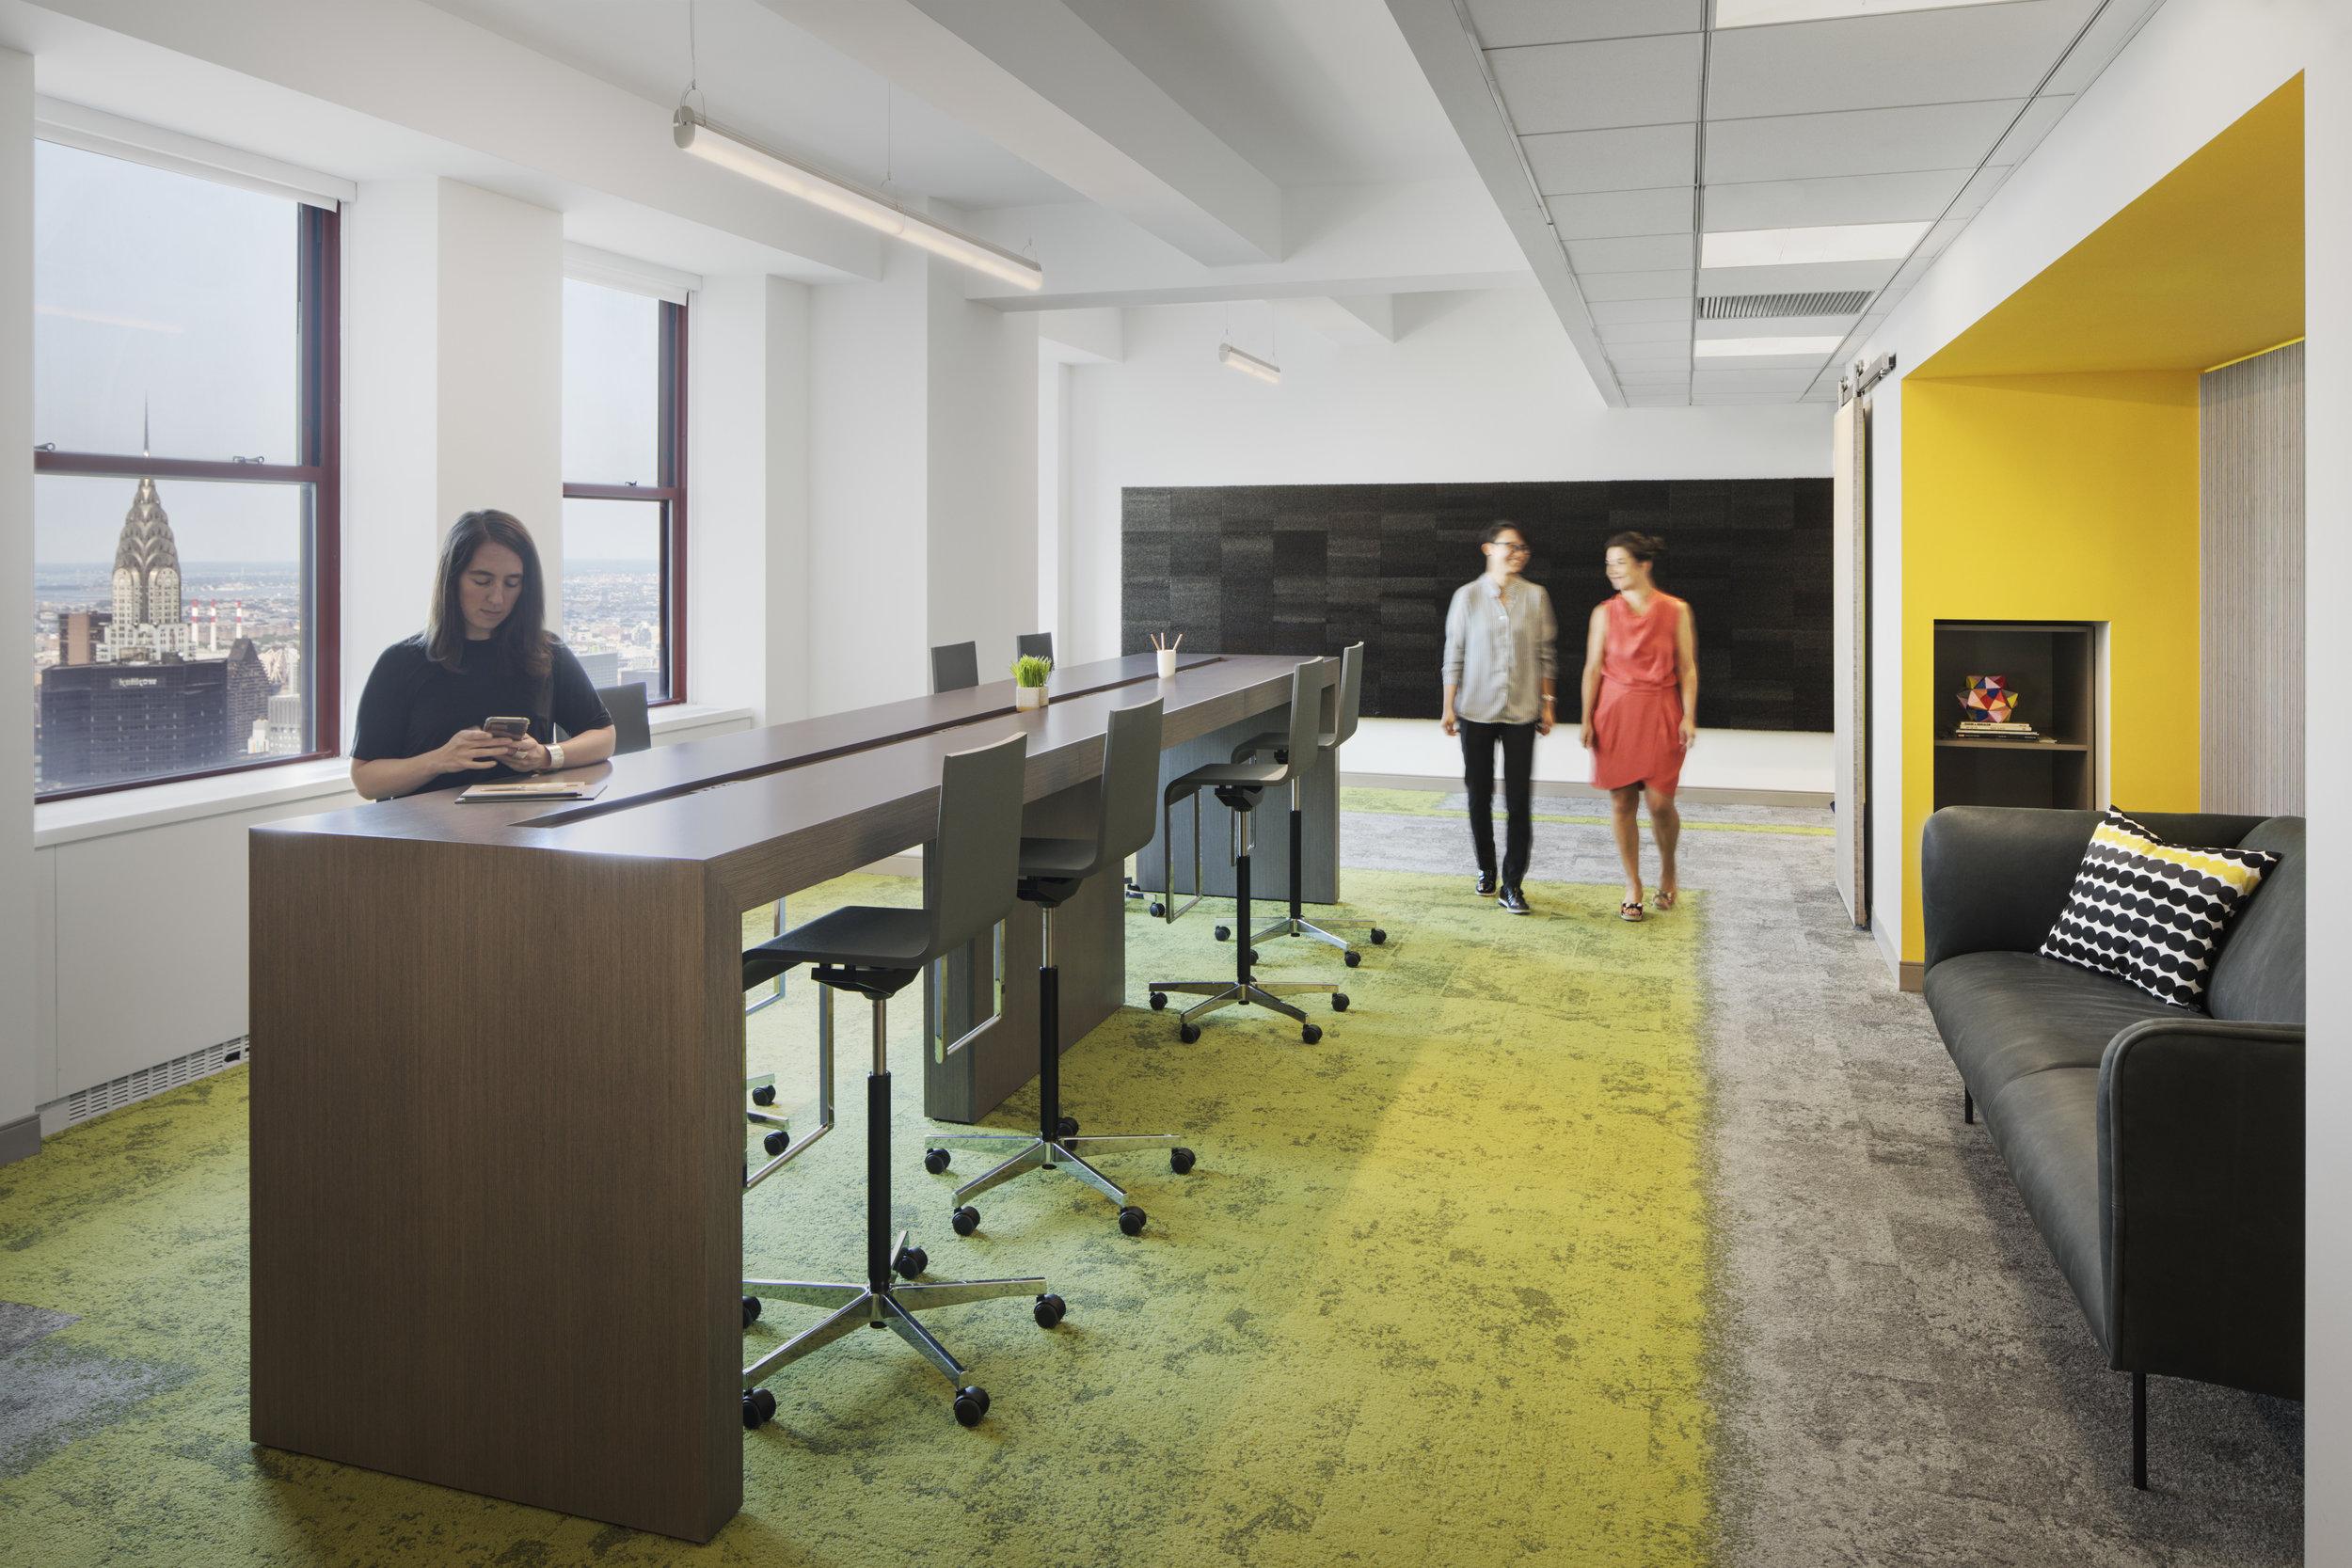 Aimco-Empire-State-Bldg-Entry-Conference-Table-JMorris-Design-NYC-Interior-Design-Studio.jpg